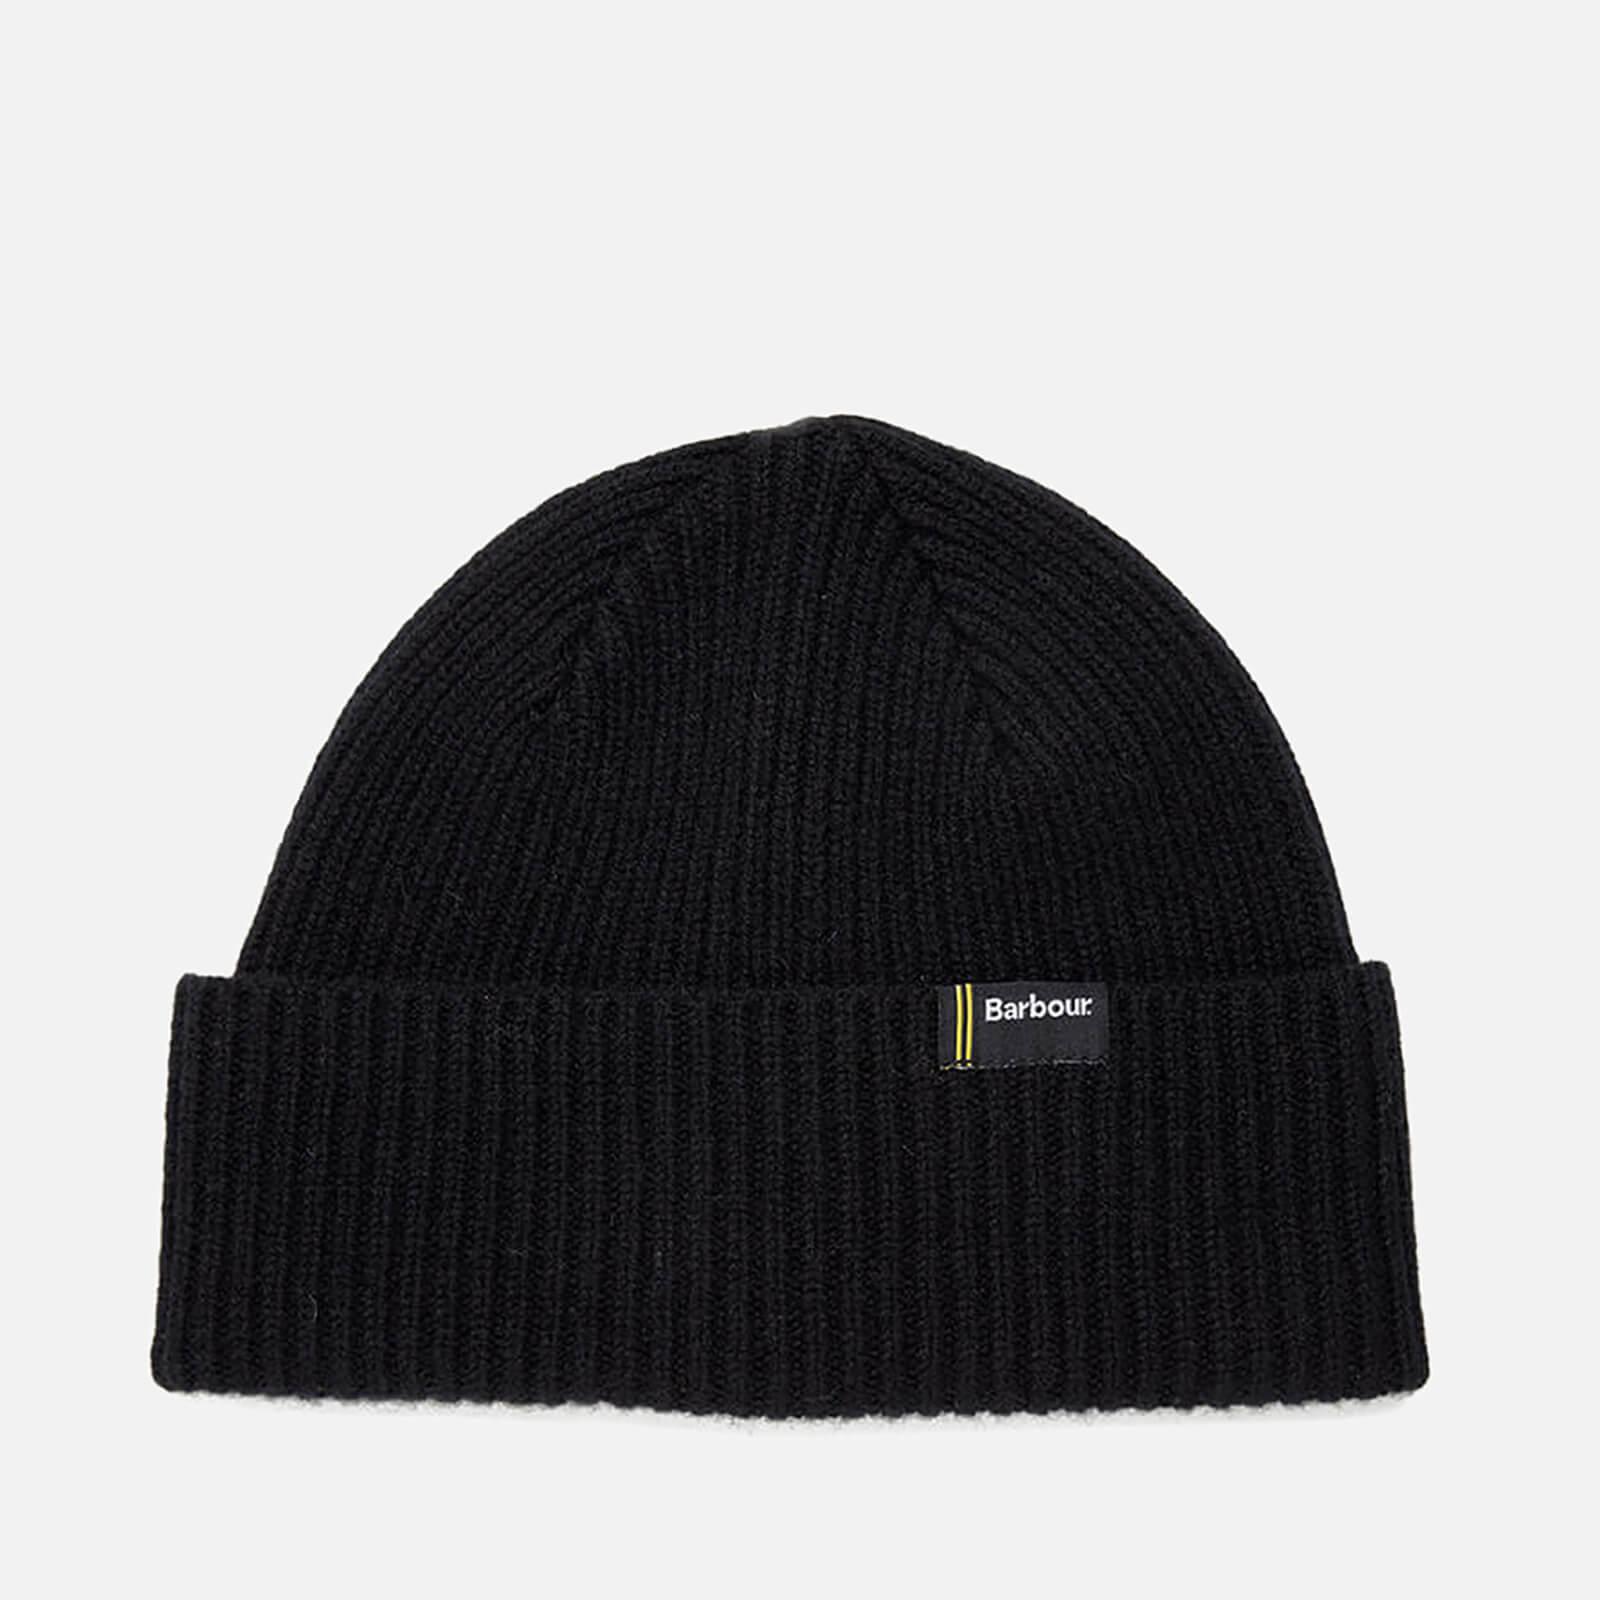 eb7882717a328 Barbour International Men's Beanie Hat - Black - One Size